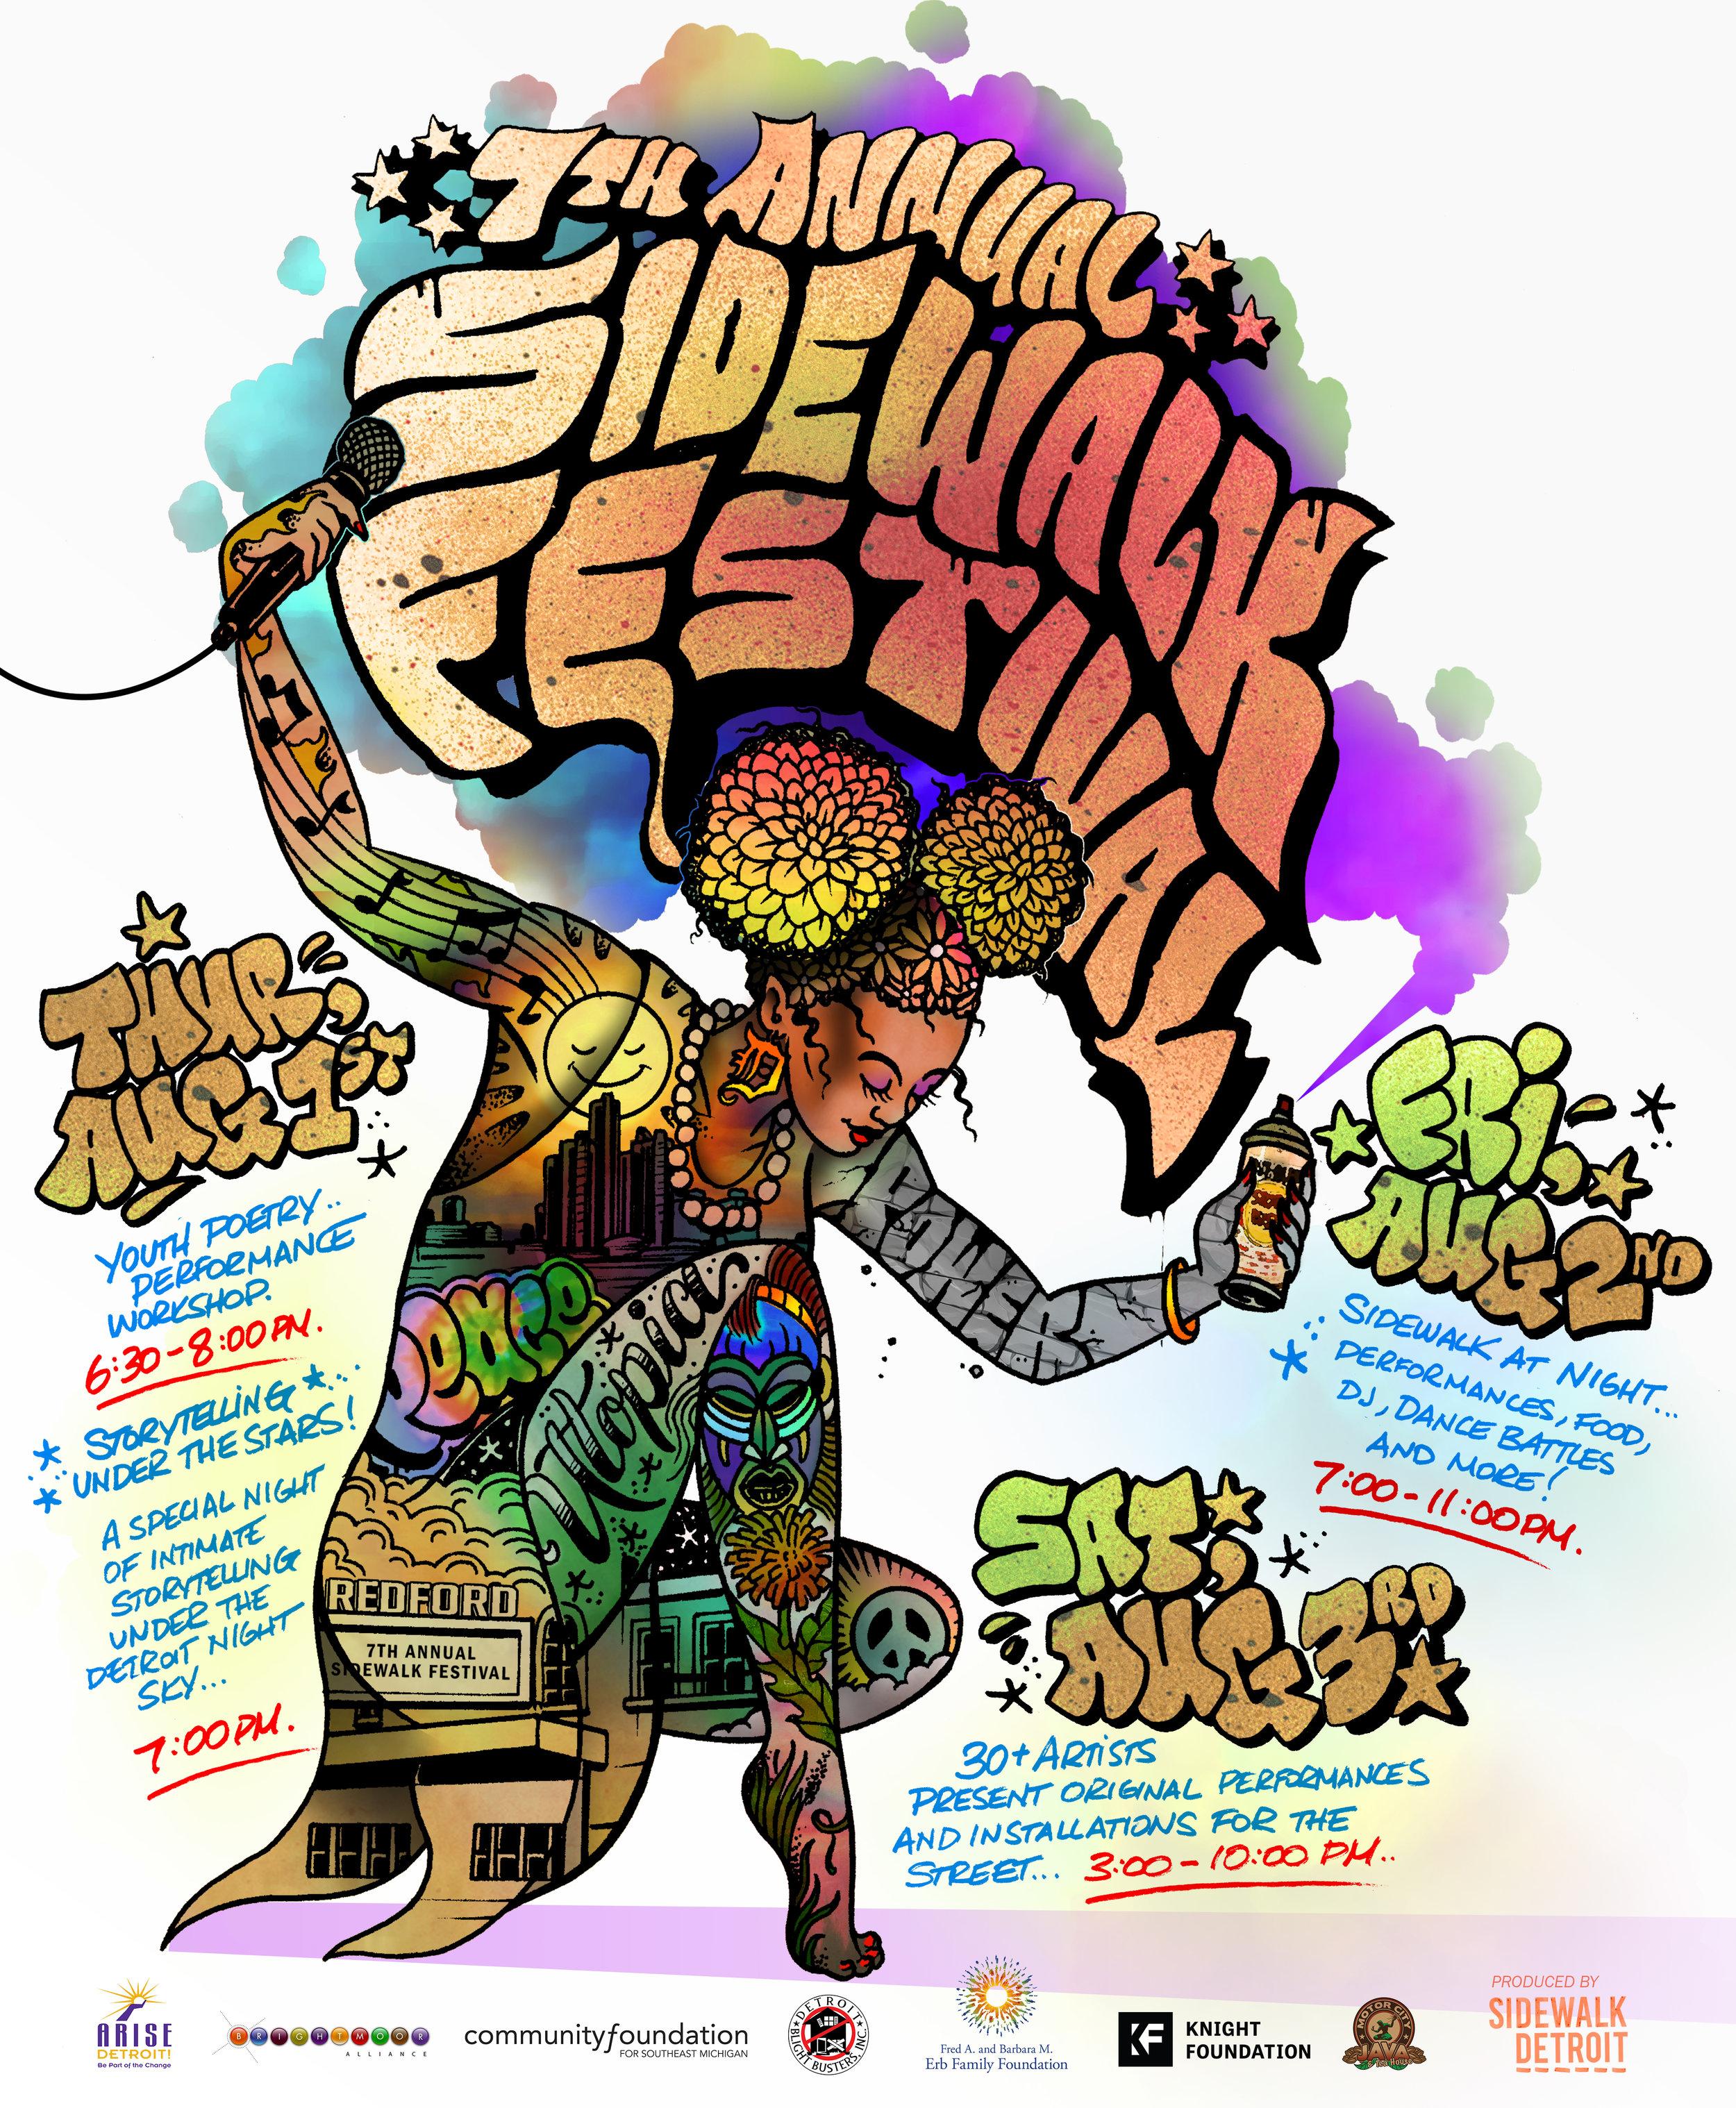 Sidewalk Festival Poster Final 18X24 62519.jpg